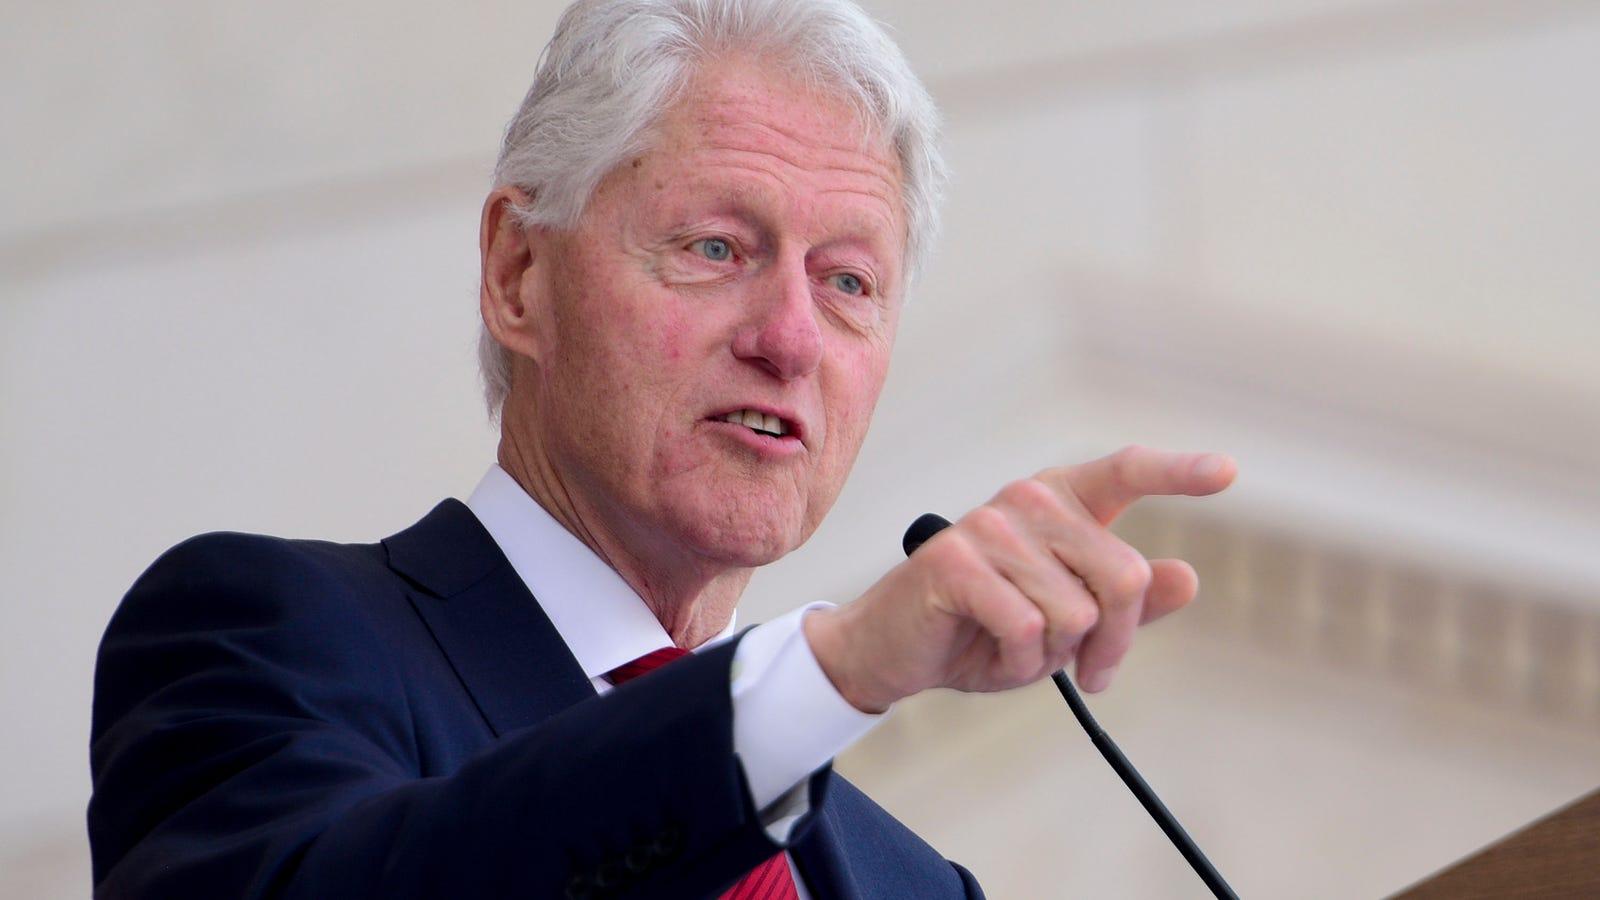 Jezebel Investigates: Does Bill Clinton Hate Loud Music?